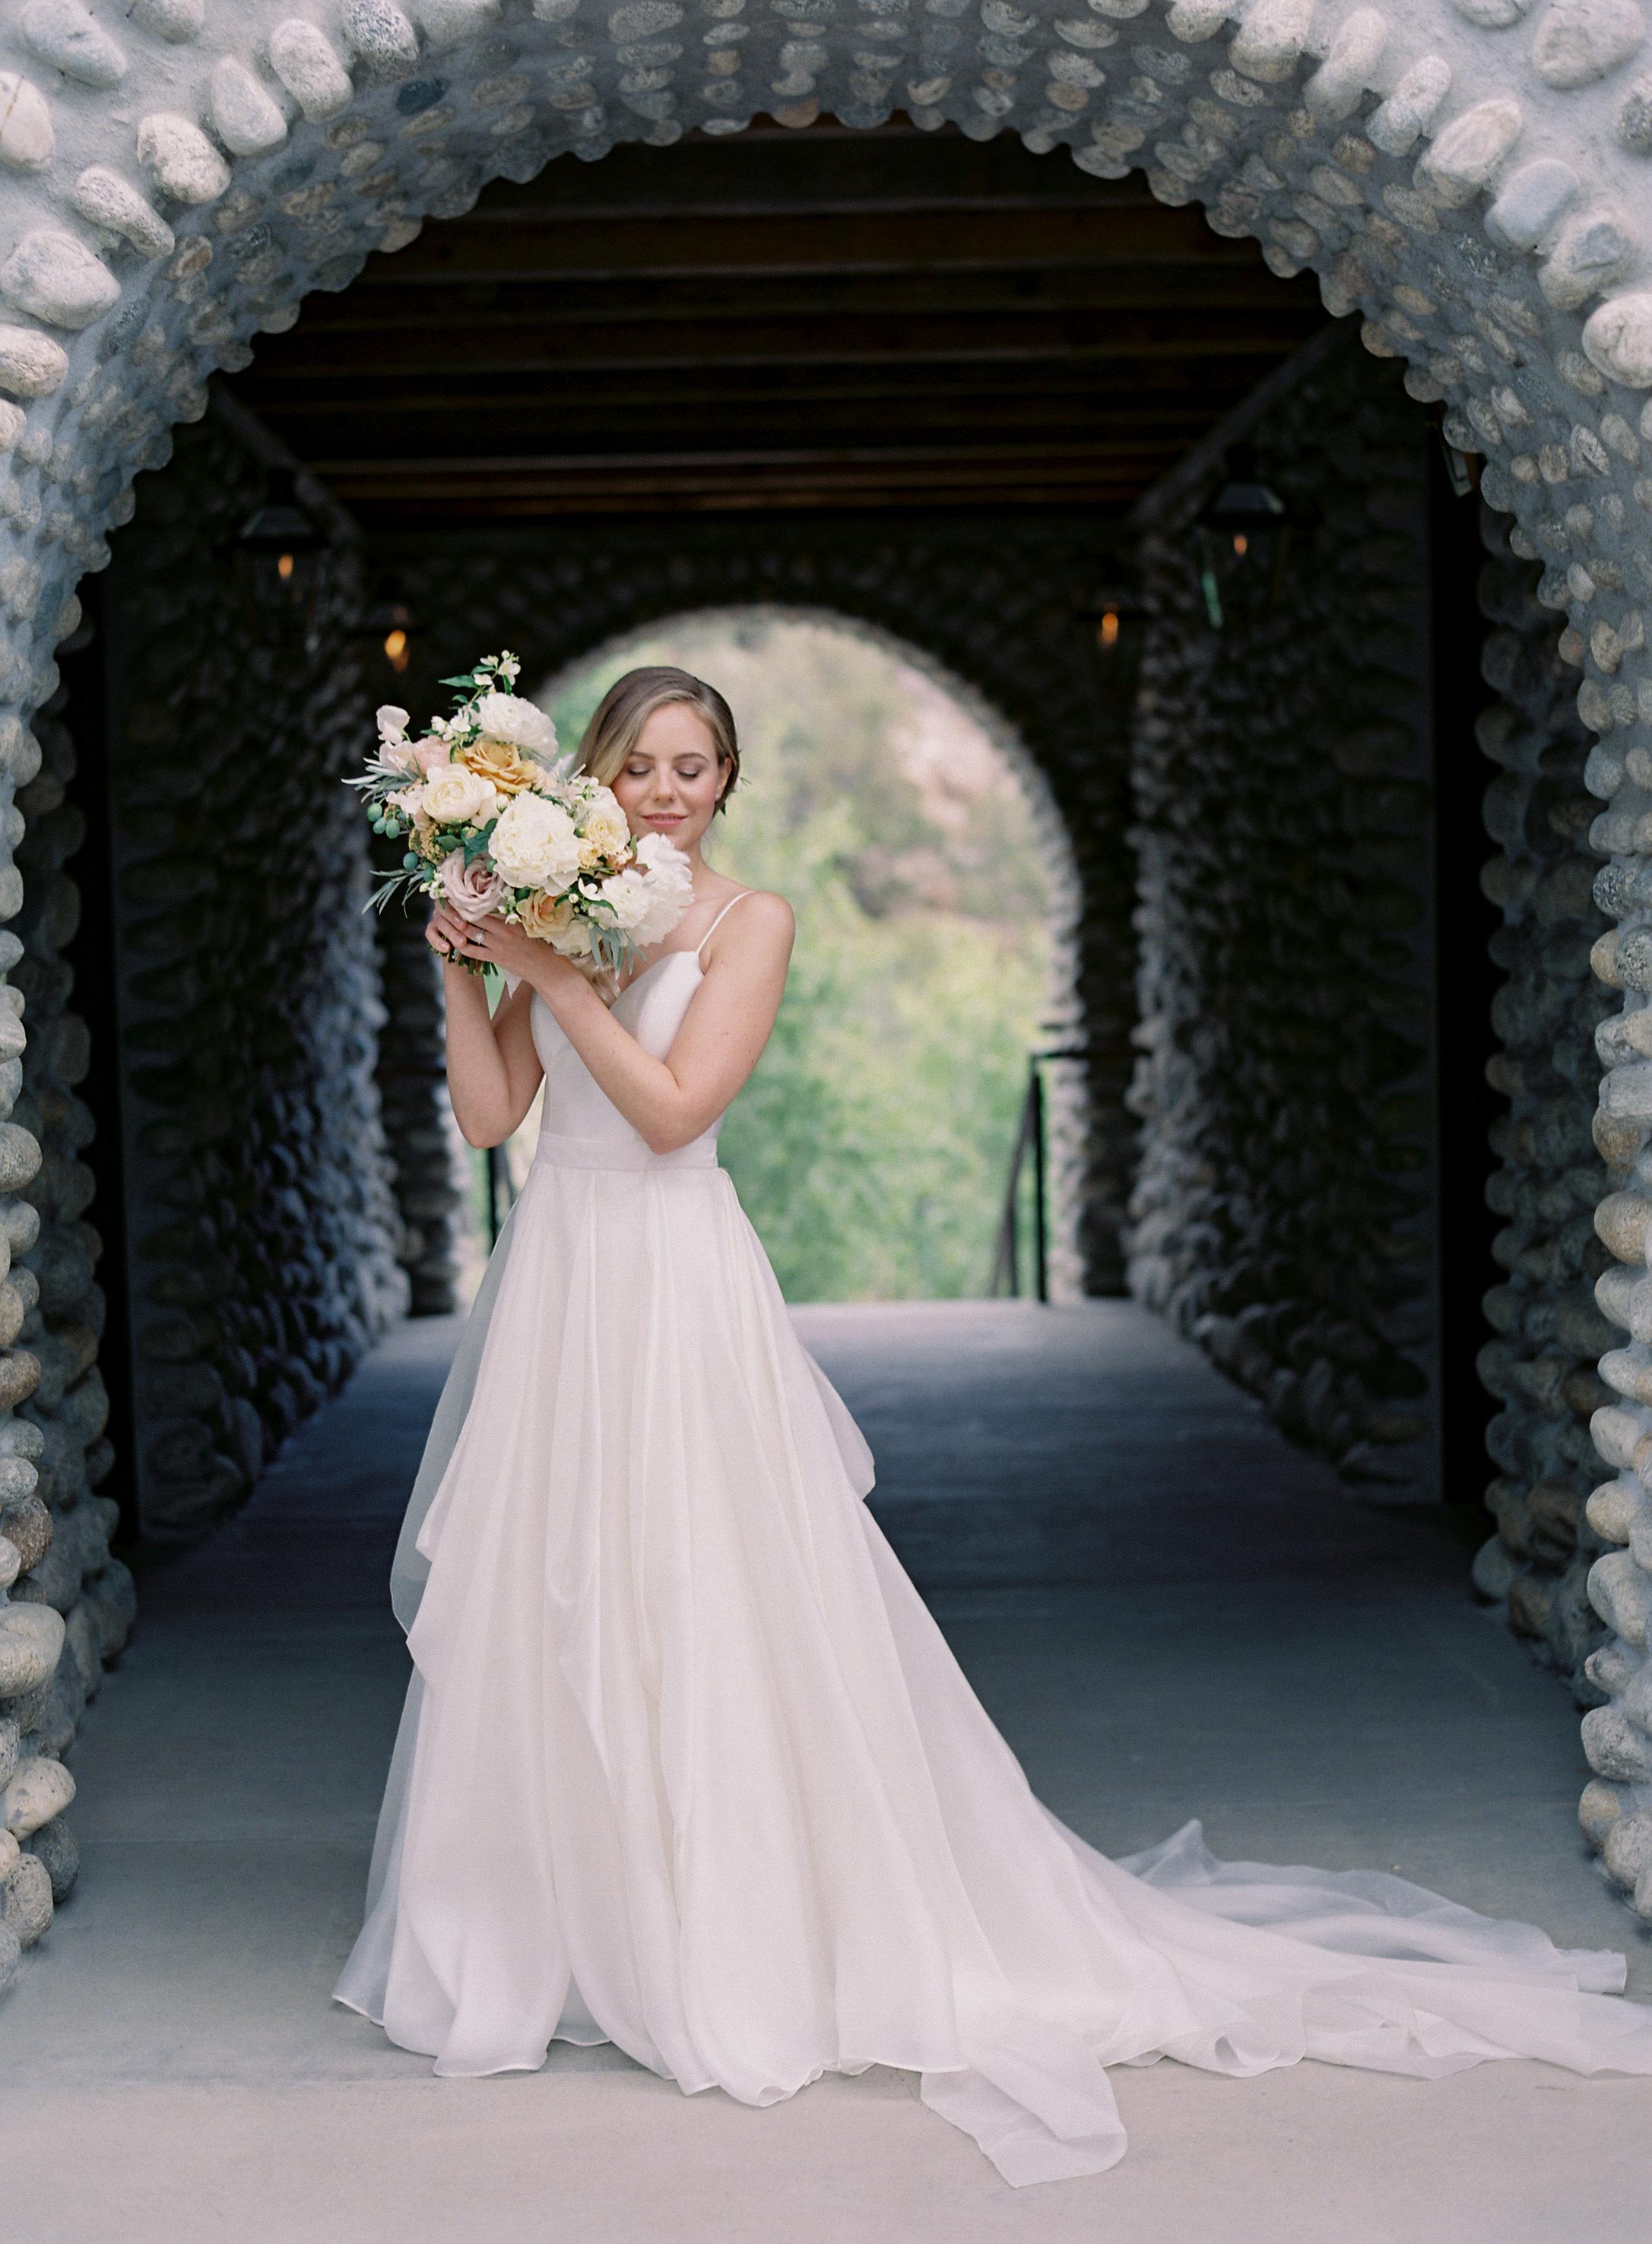 Jessica and Thomas-Wedding-Carrie King Photographer-5.jpg